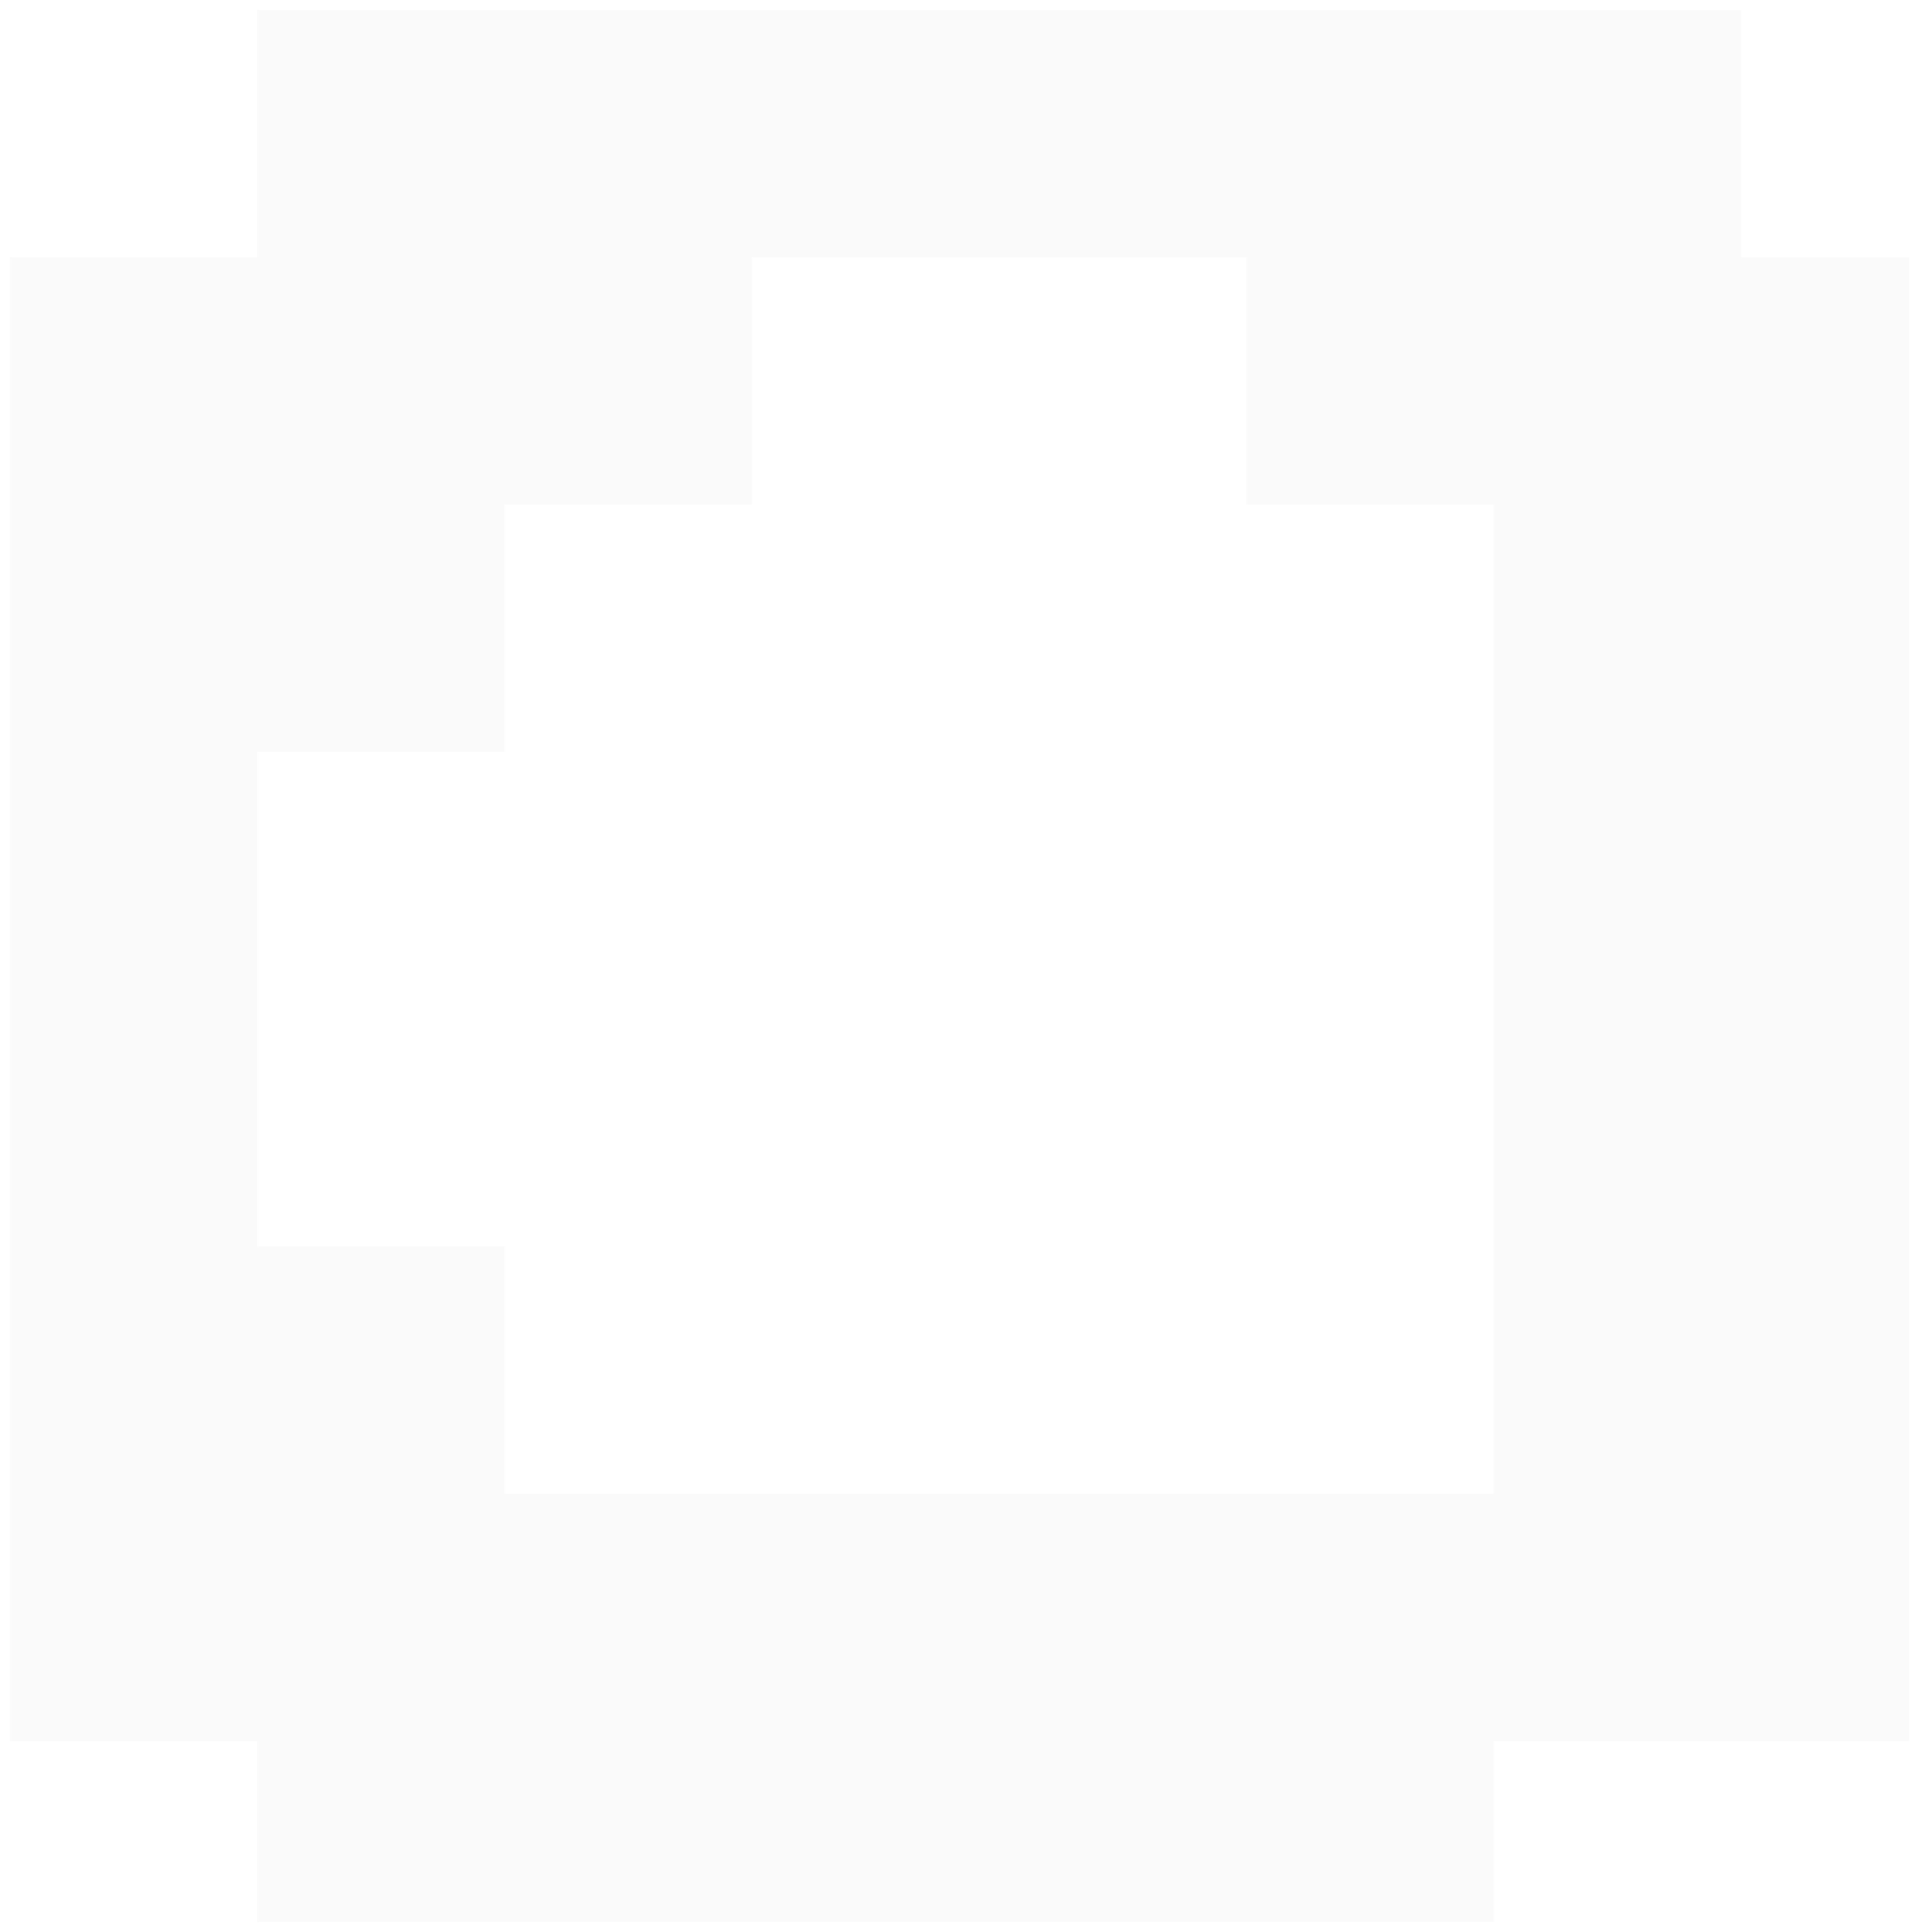 Frame transparent png clip. Lace clipart grey border